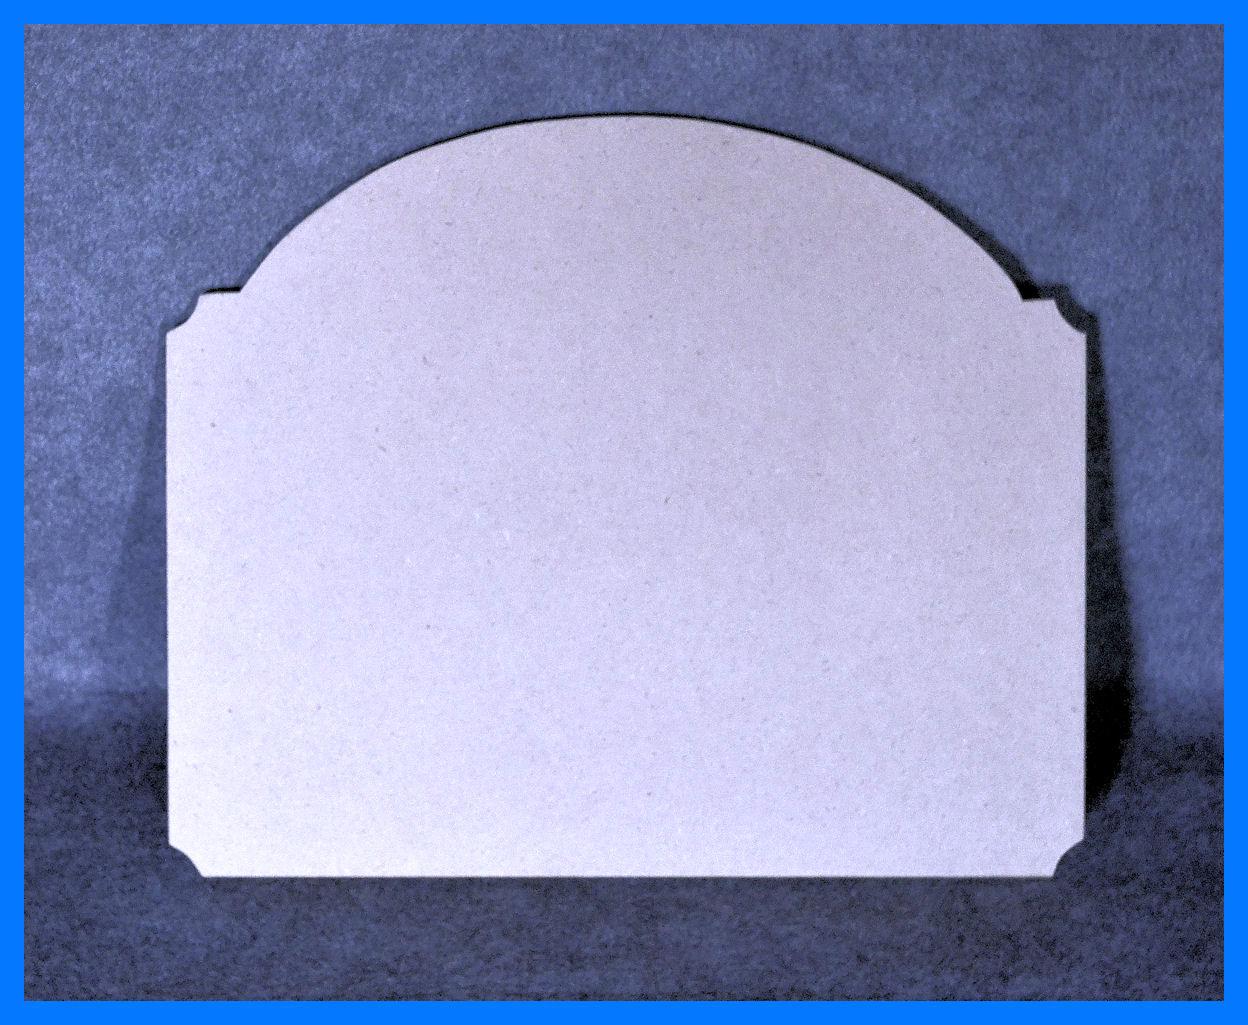 wood-sign-board-192320161a.jpg